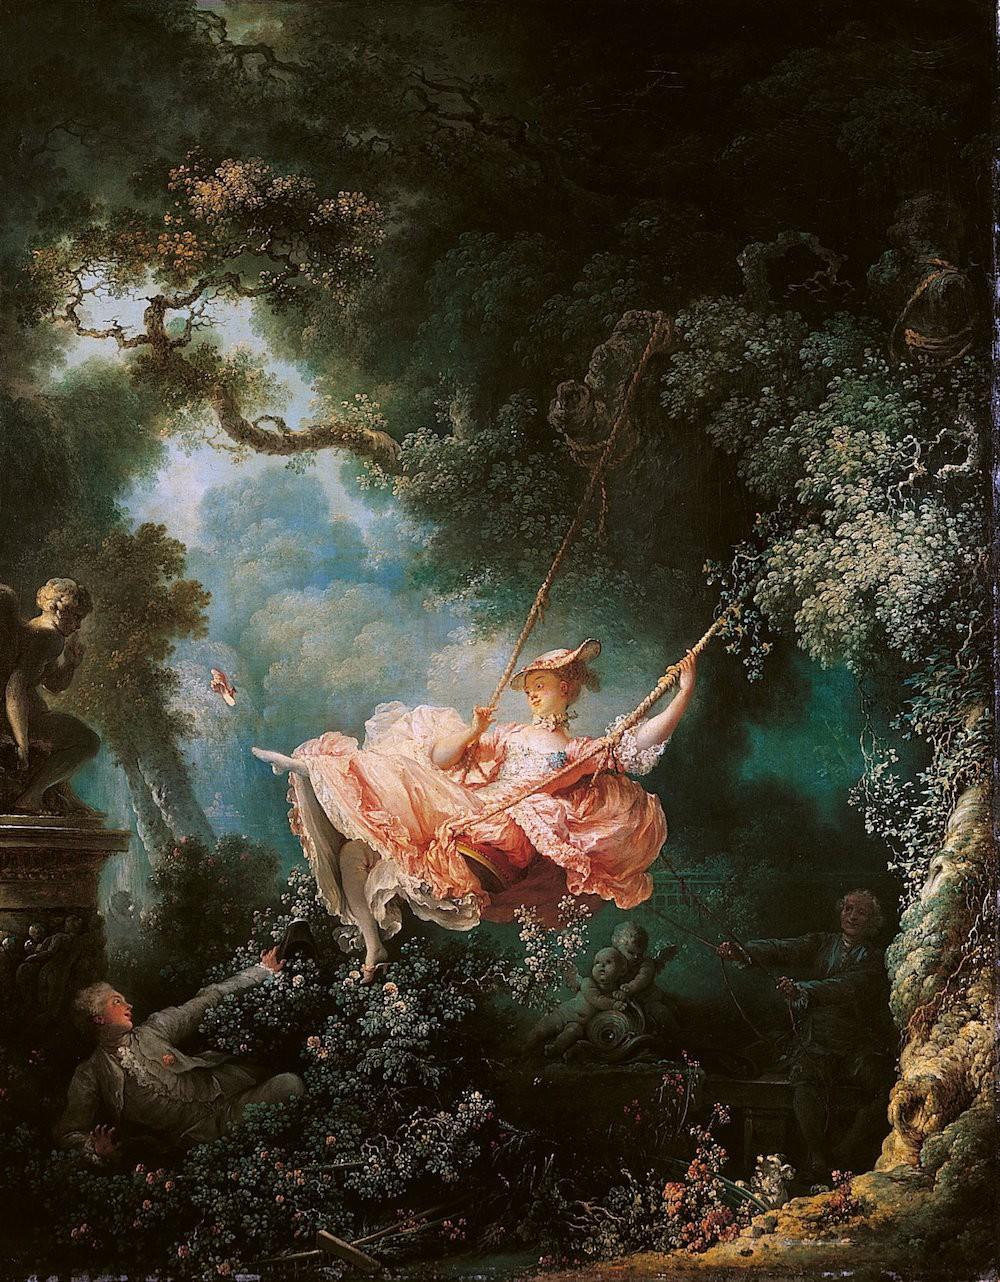 10 Breathtaking Paintings Of Gardens